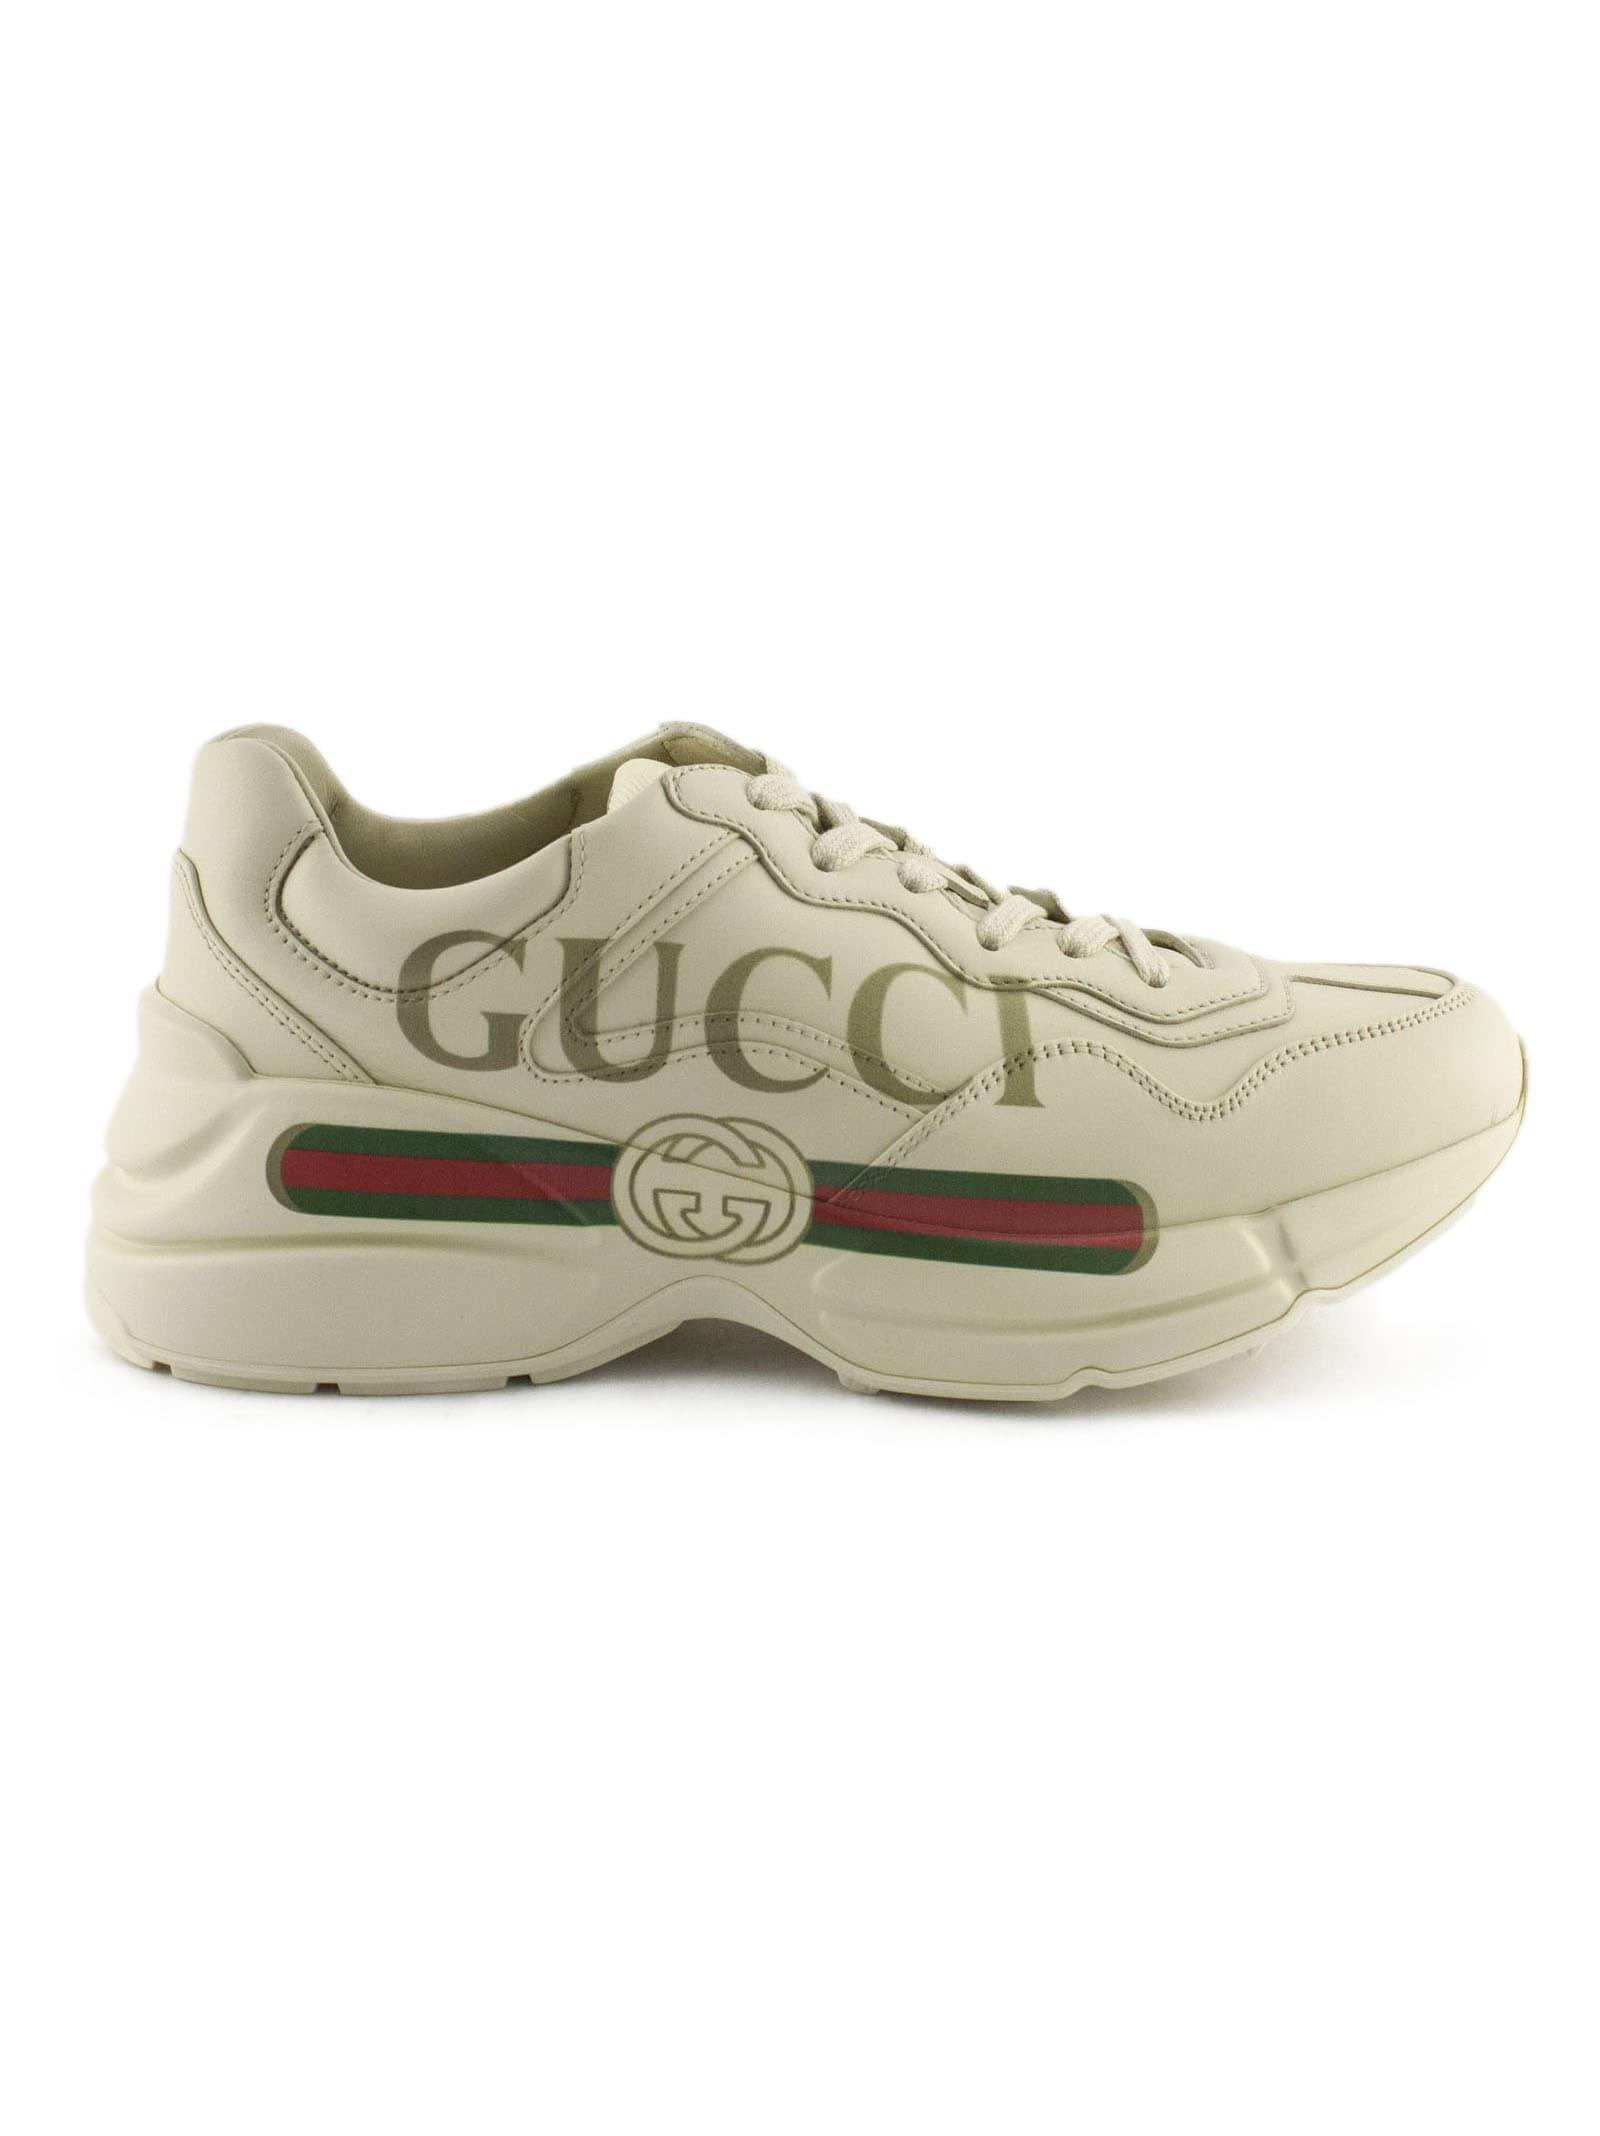 Gucci Rhyton Ivory Sneaker